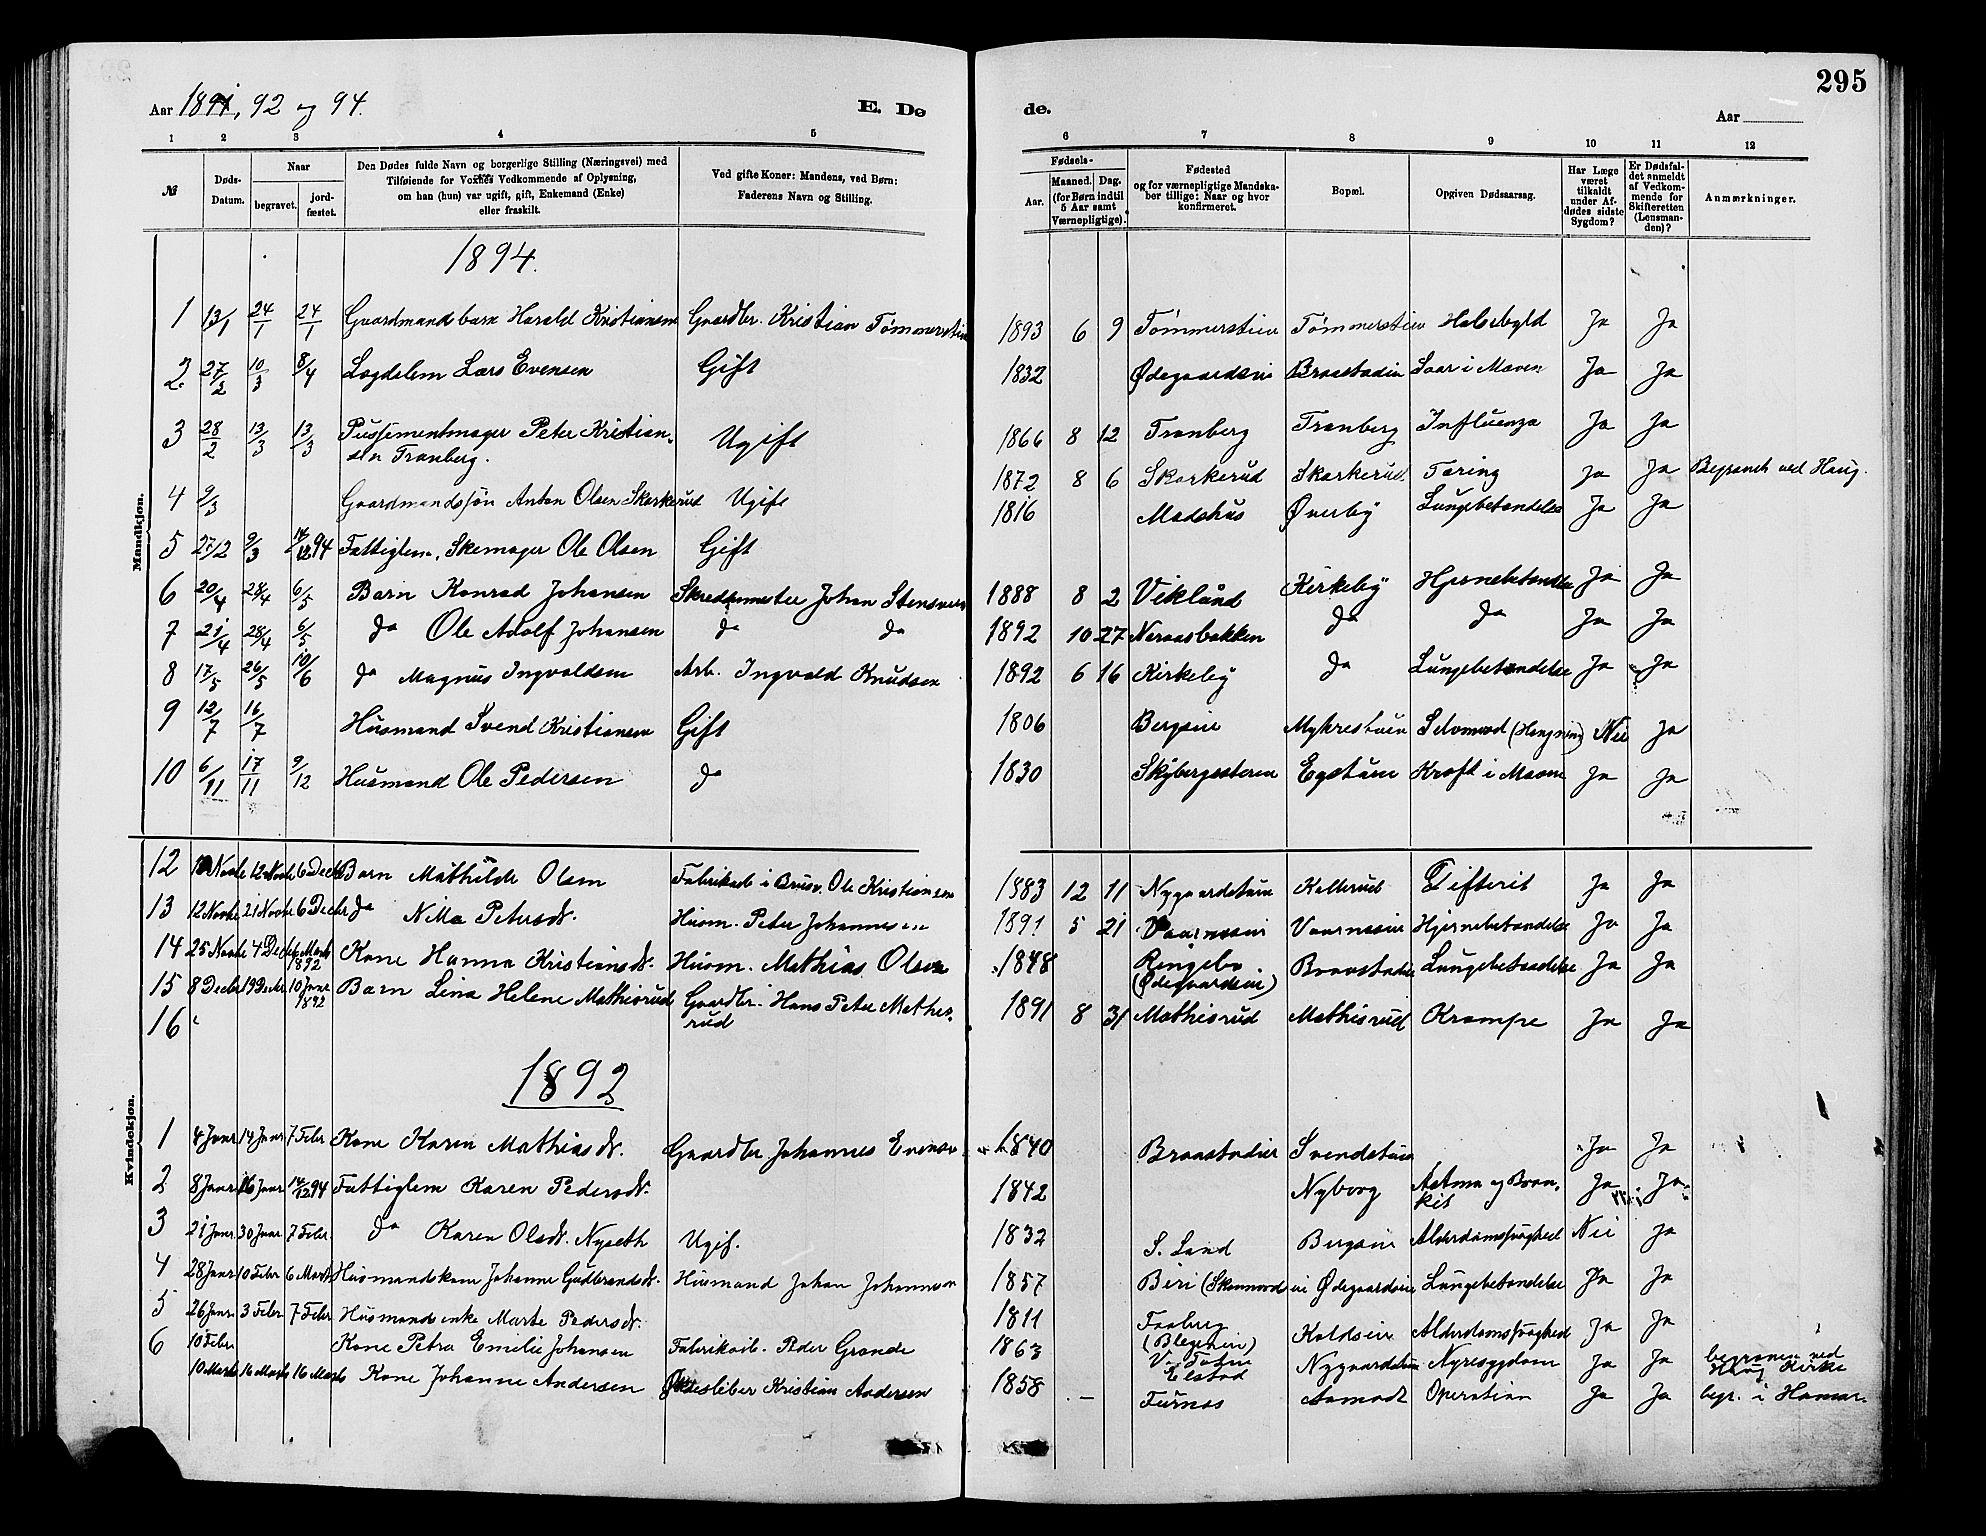 SAH, Vardal prestekontor, H/Ha/Hab/L0007: Klokkerbok nr. 7 /1, 1881-1895, s. 295